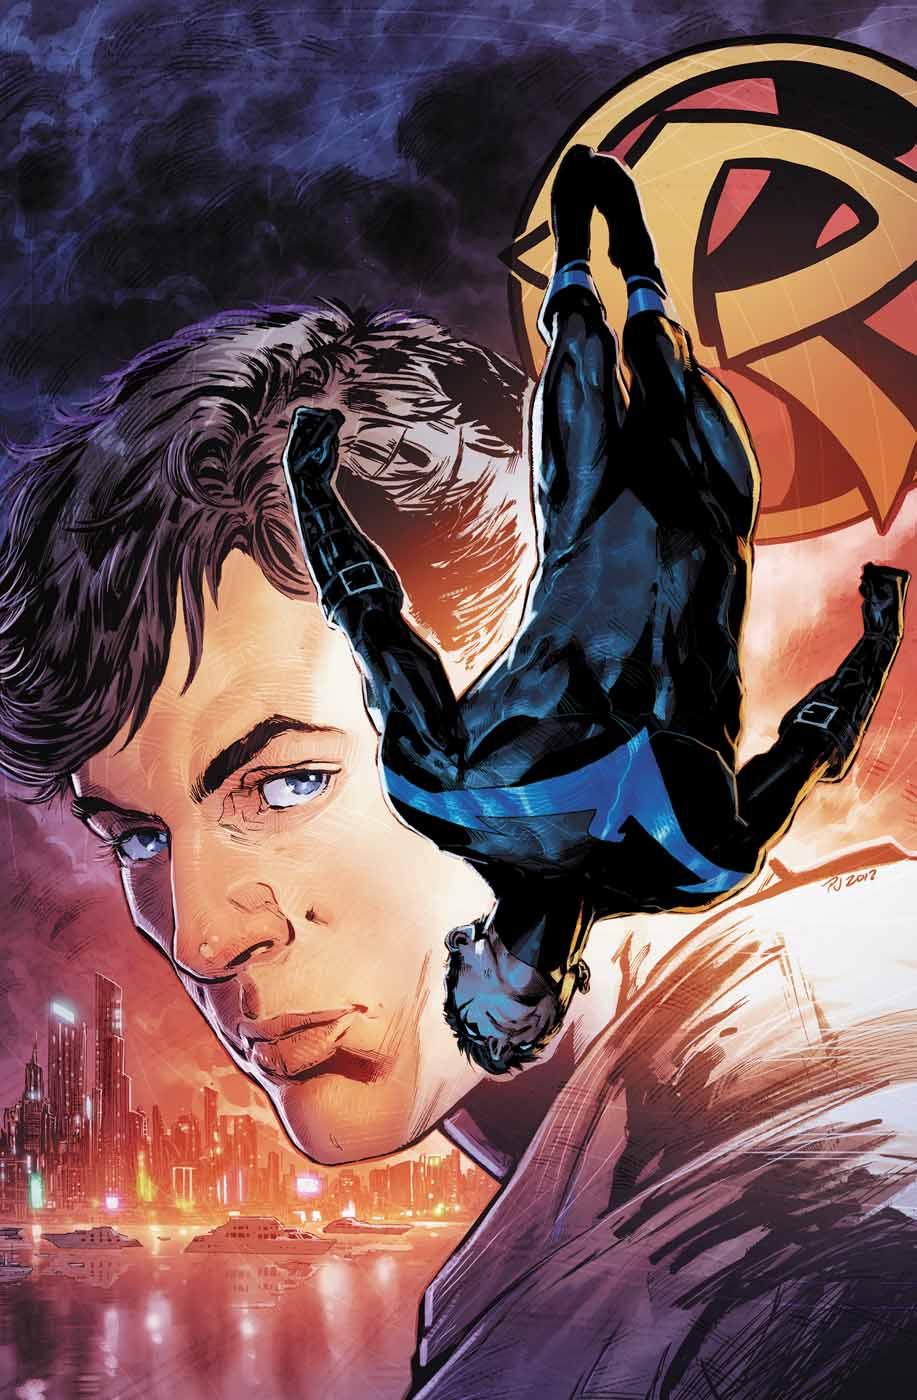 Nightwing #39